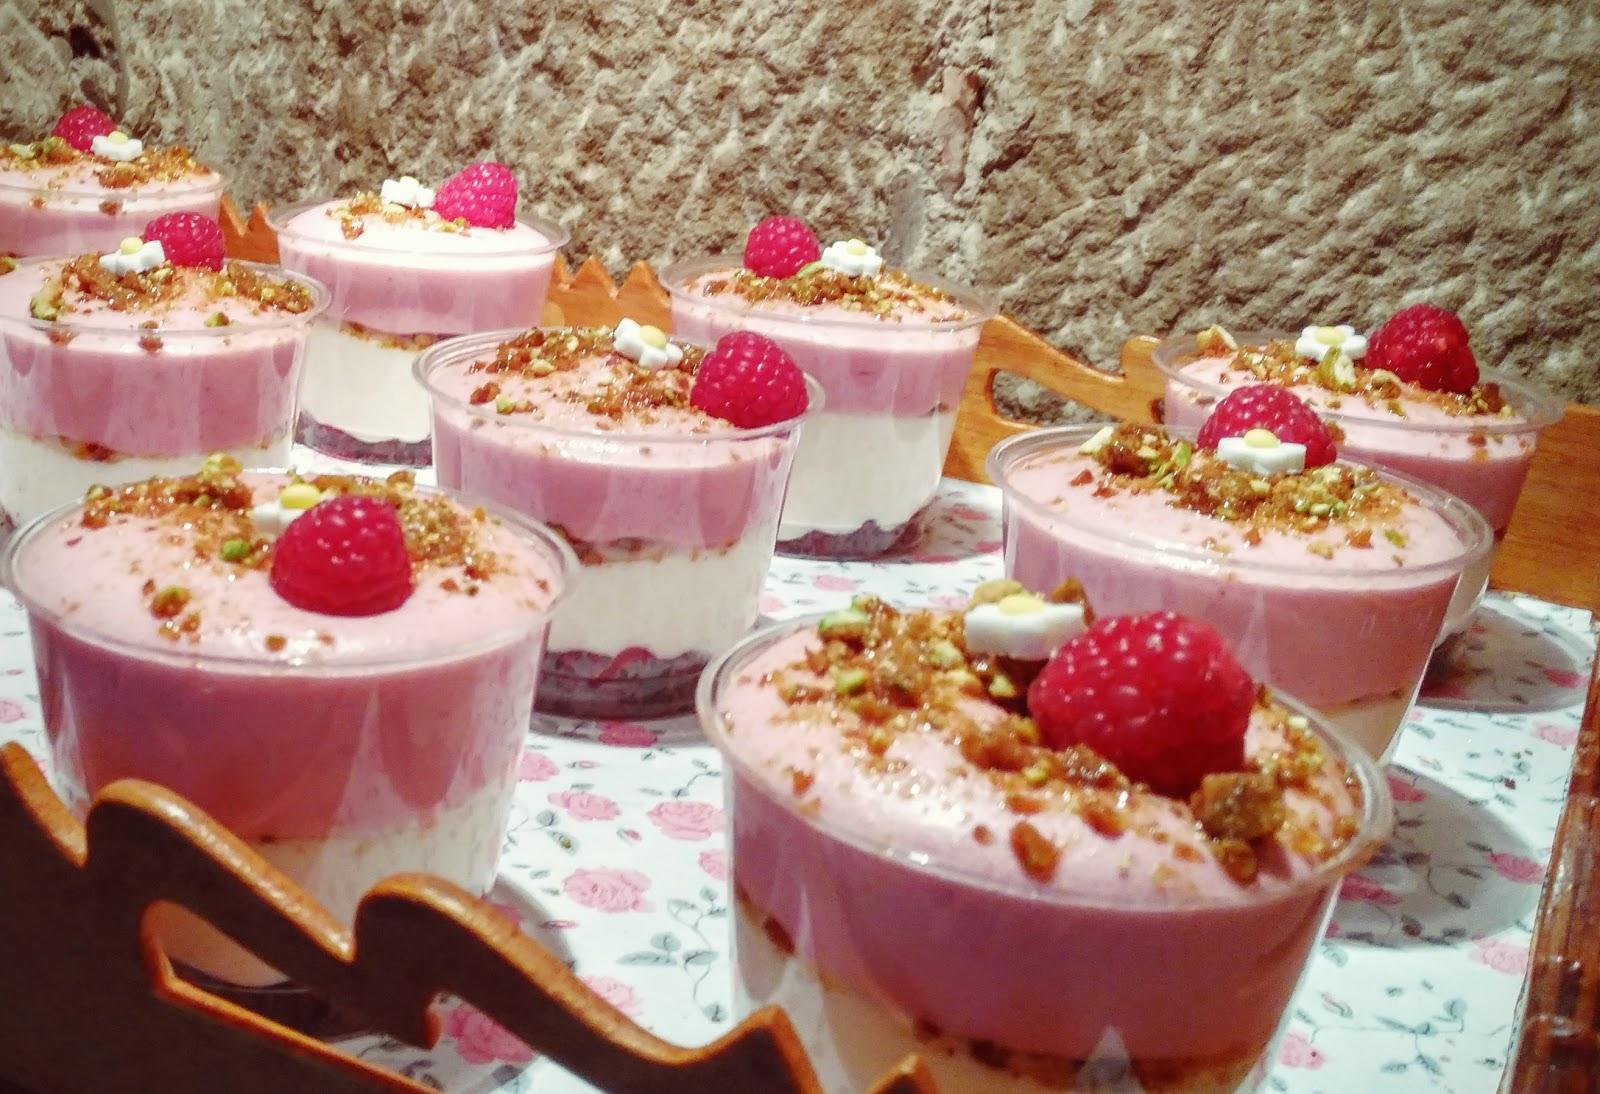 Pastel n vasitos de mousse de leche condensada y fresa - Como hacer mousse de yogurt ...